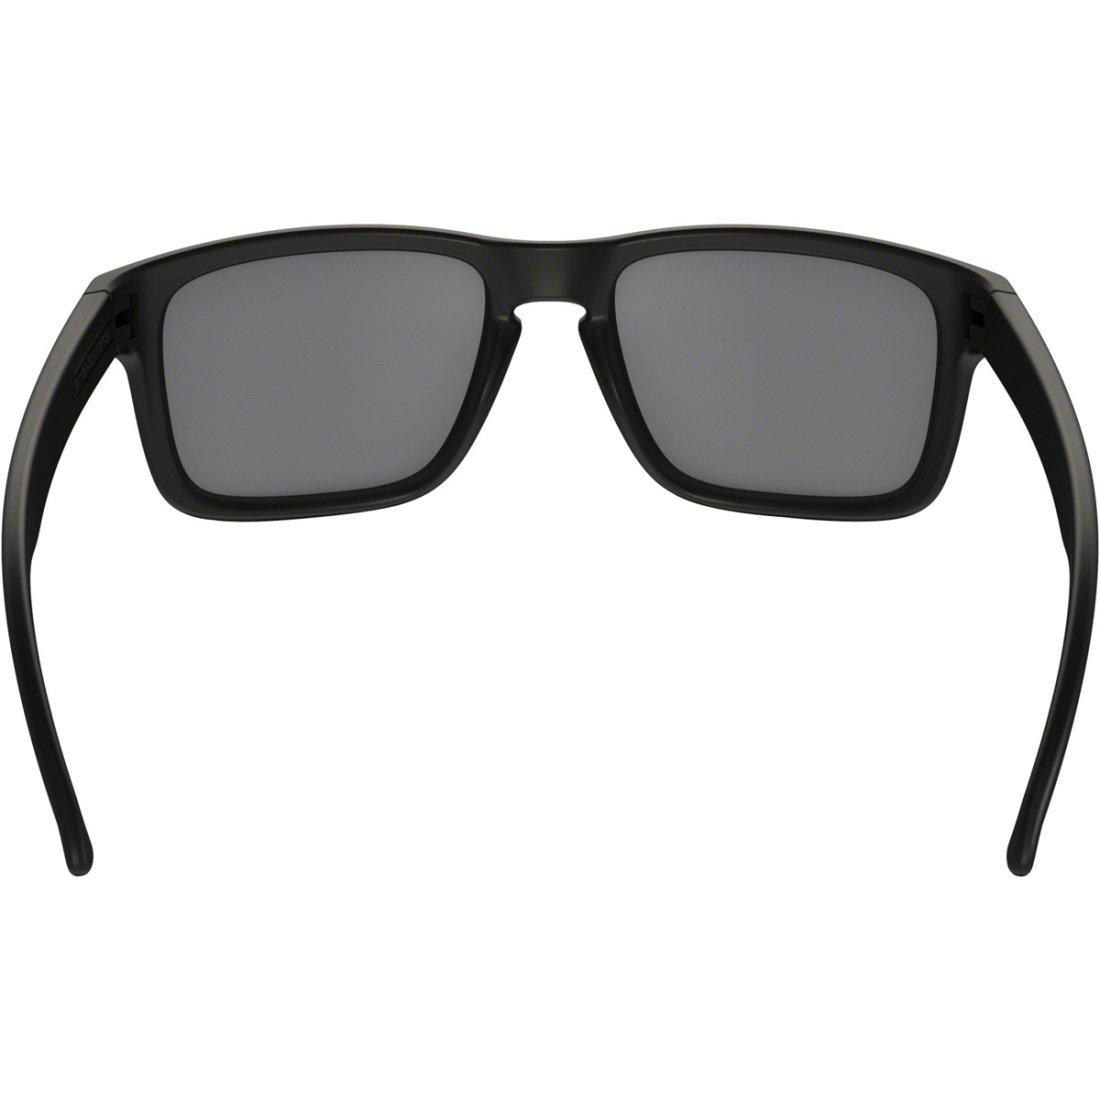 8bb871d54a OAKLEY Holbrook Matte Black   Black Iridium Sun glasses · Motocard